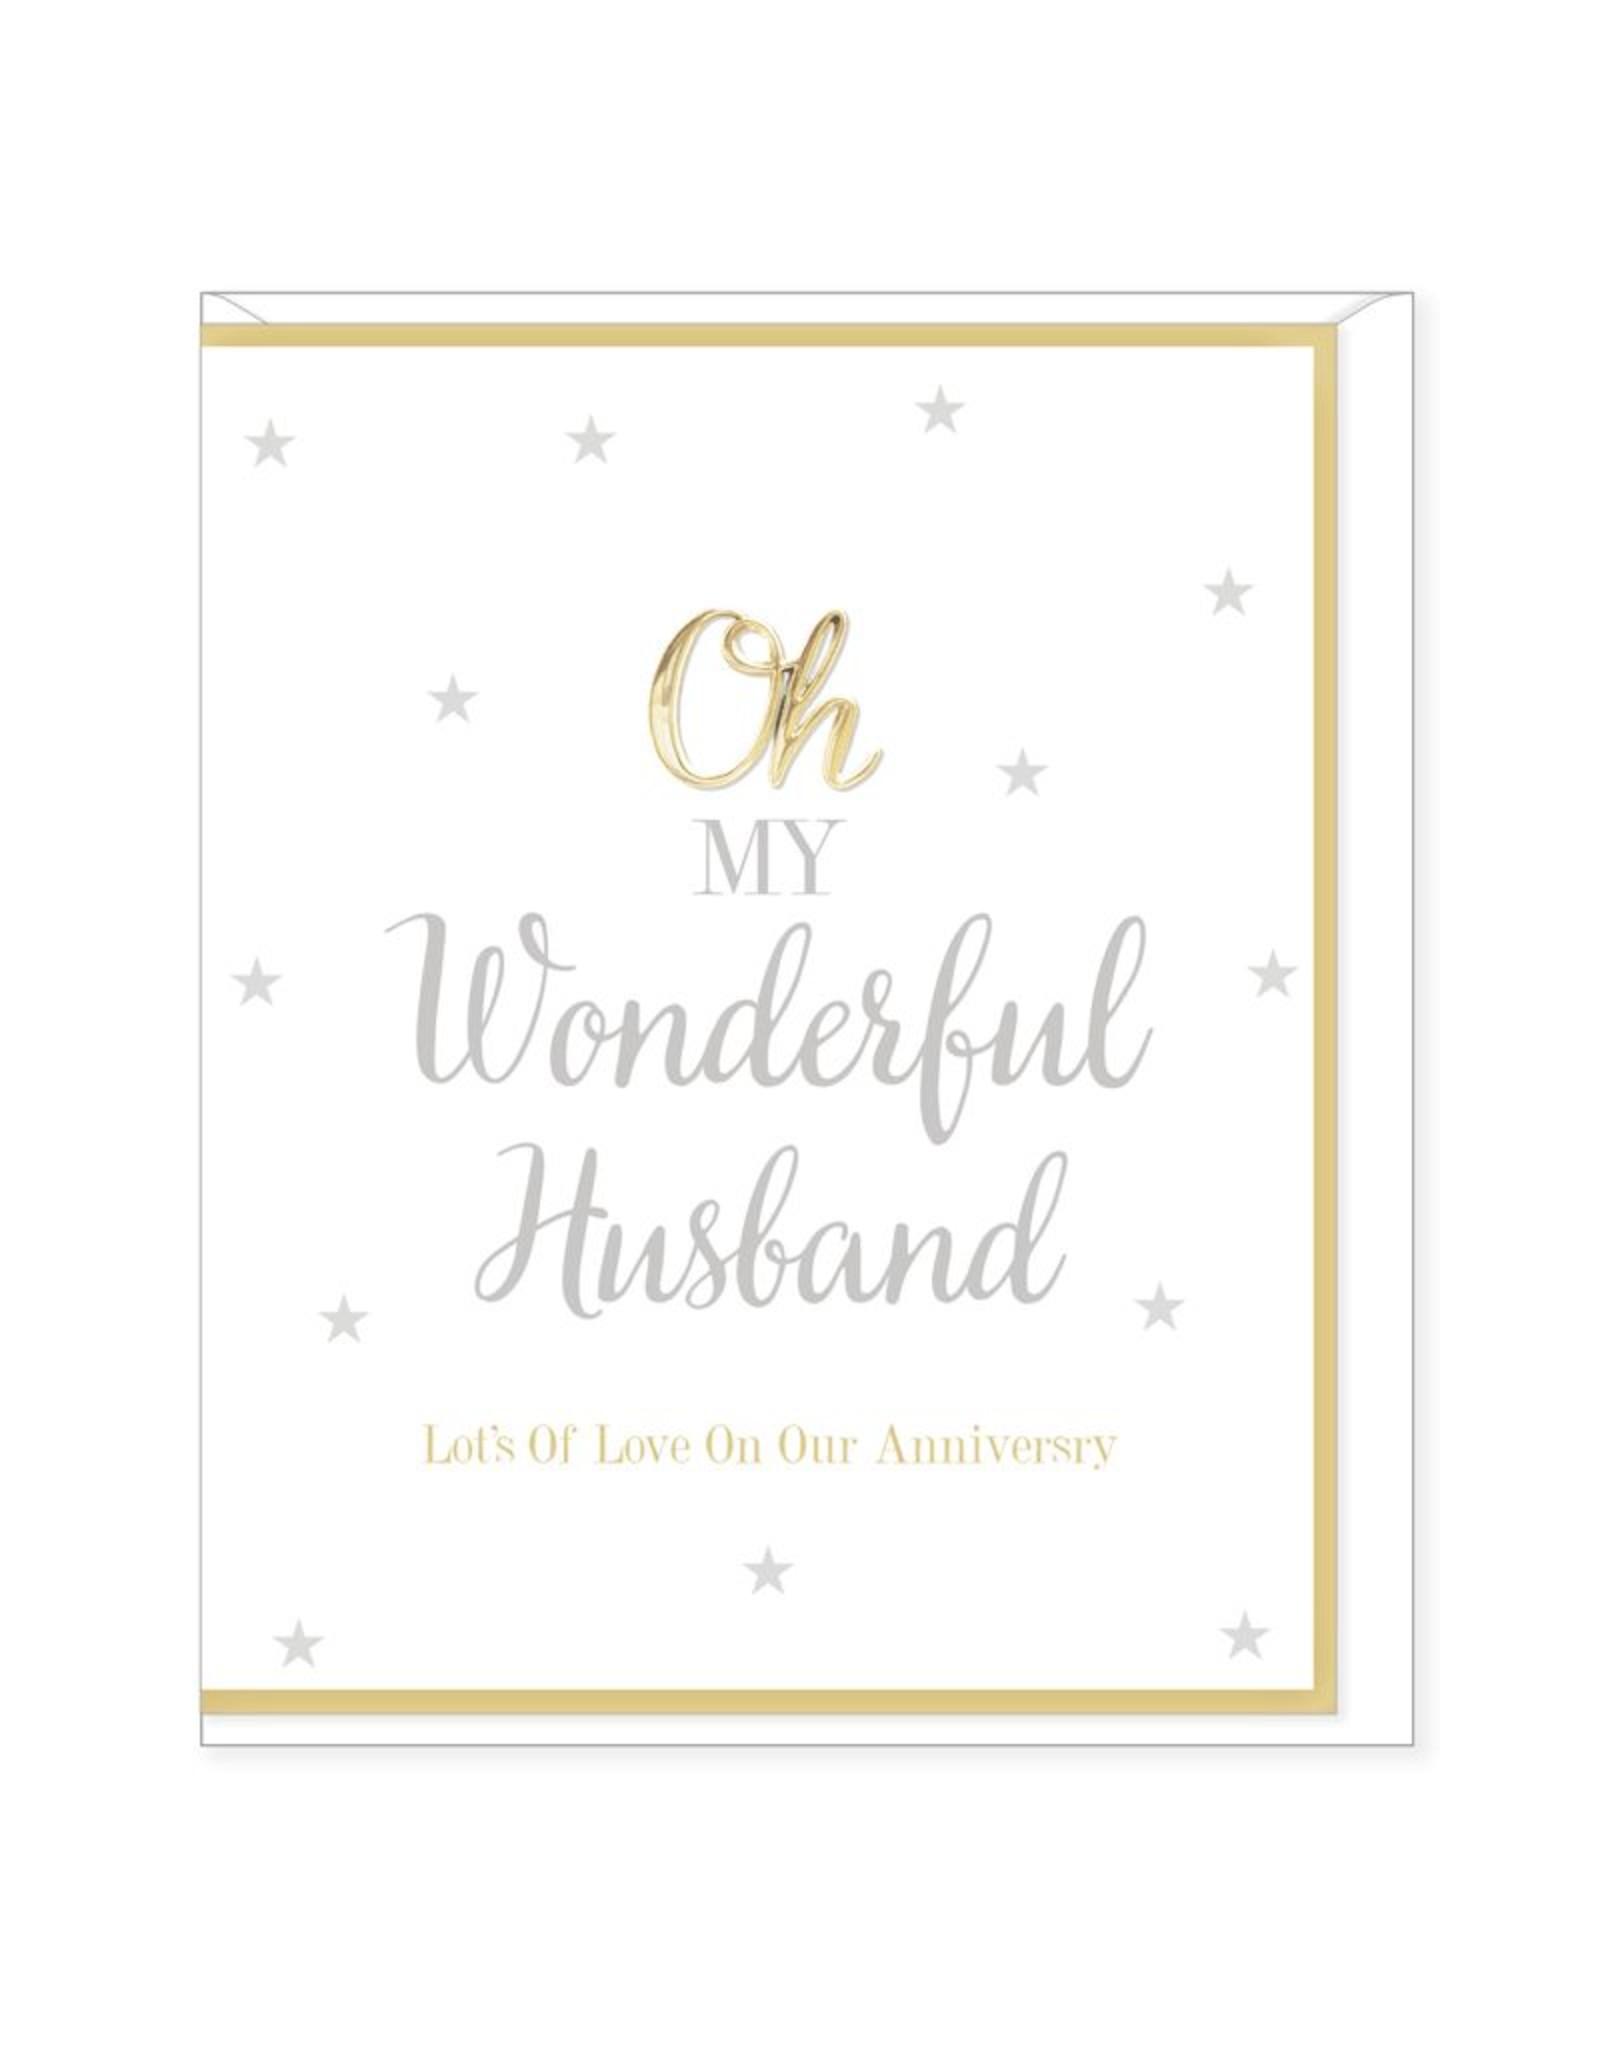 Hearts Design Wenskaart - My Wonderful Husband - Anniversary